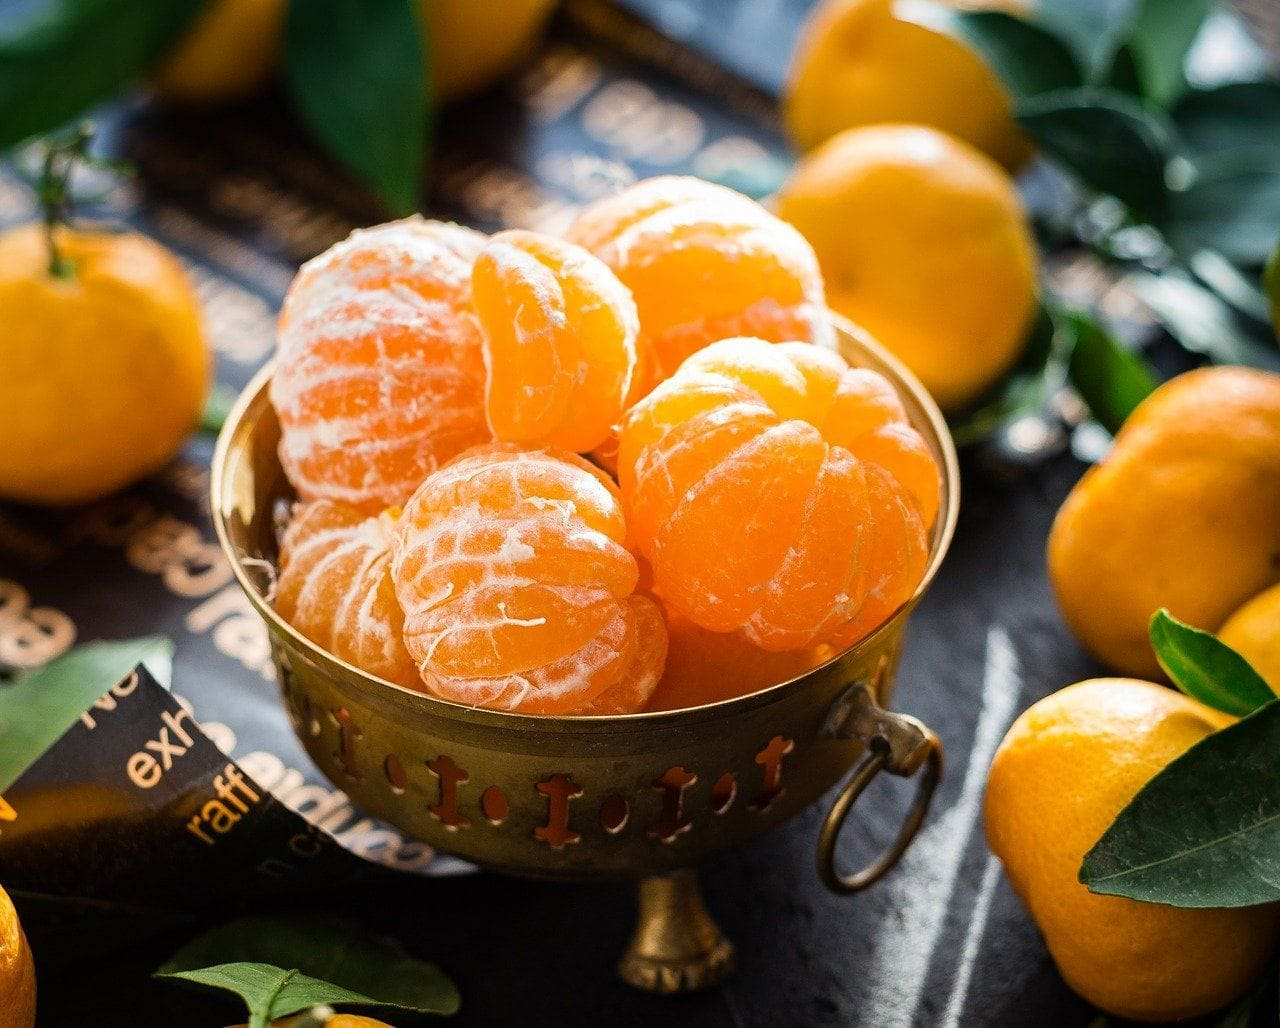 peeled mandarin oranges in a cup